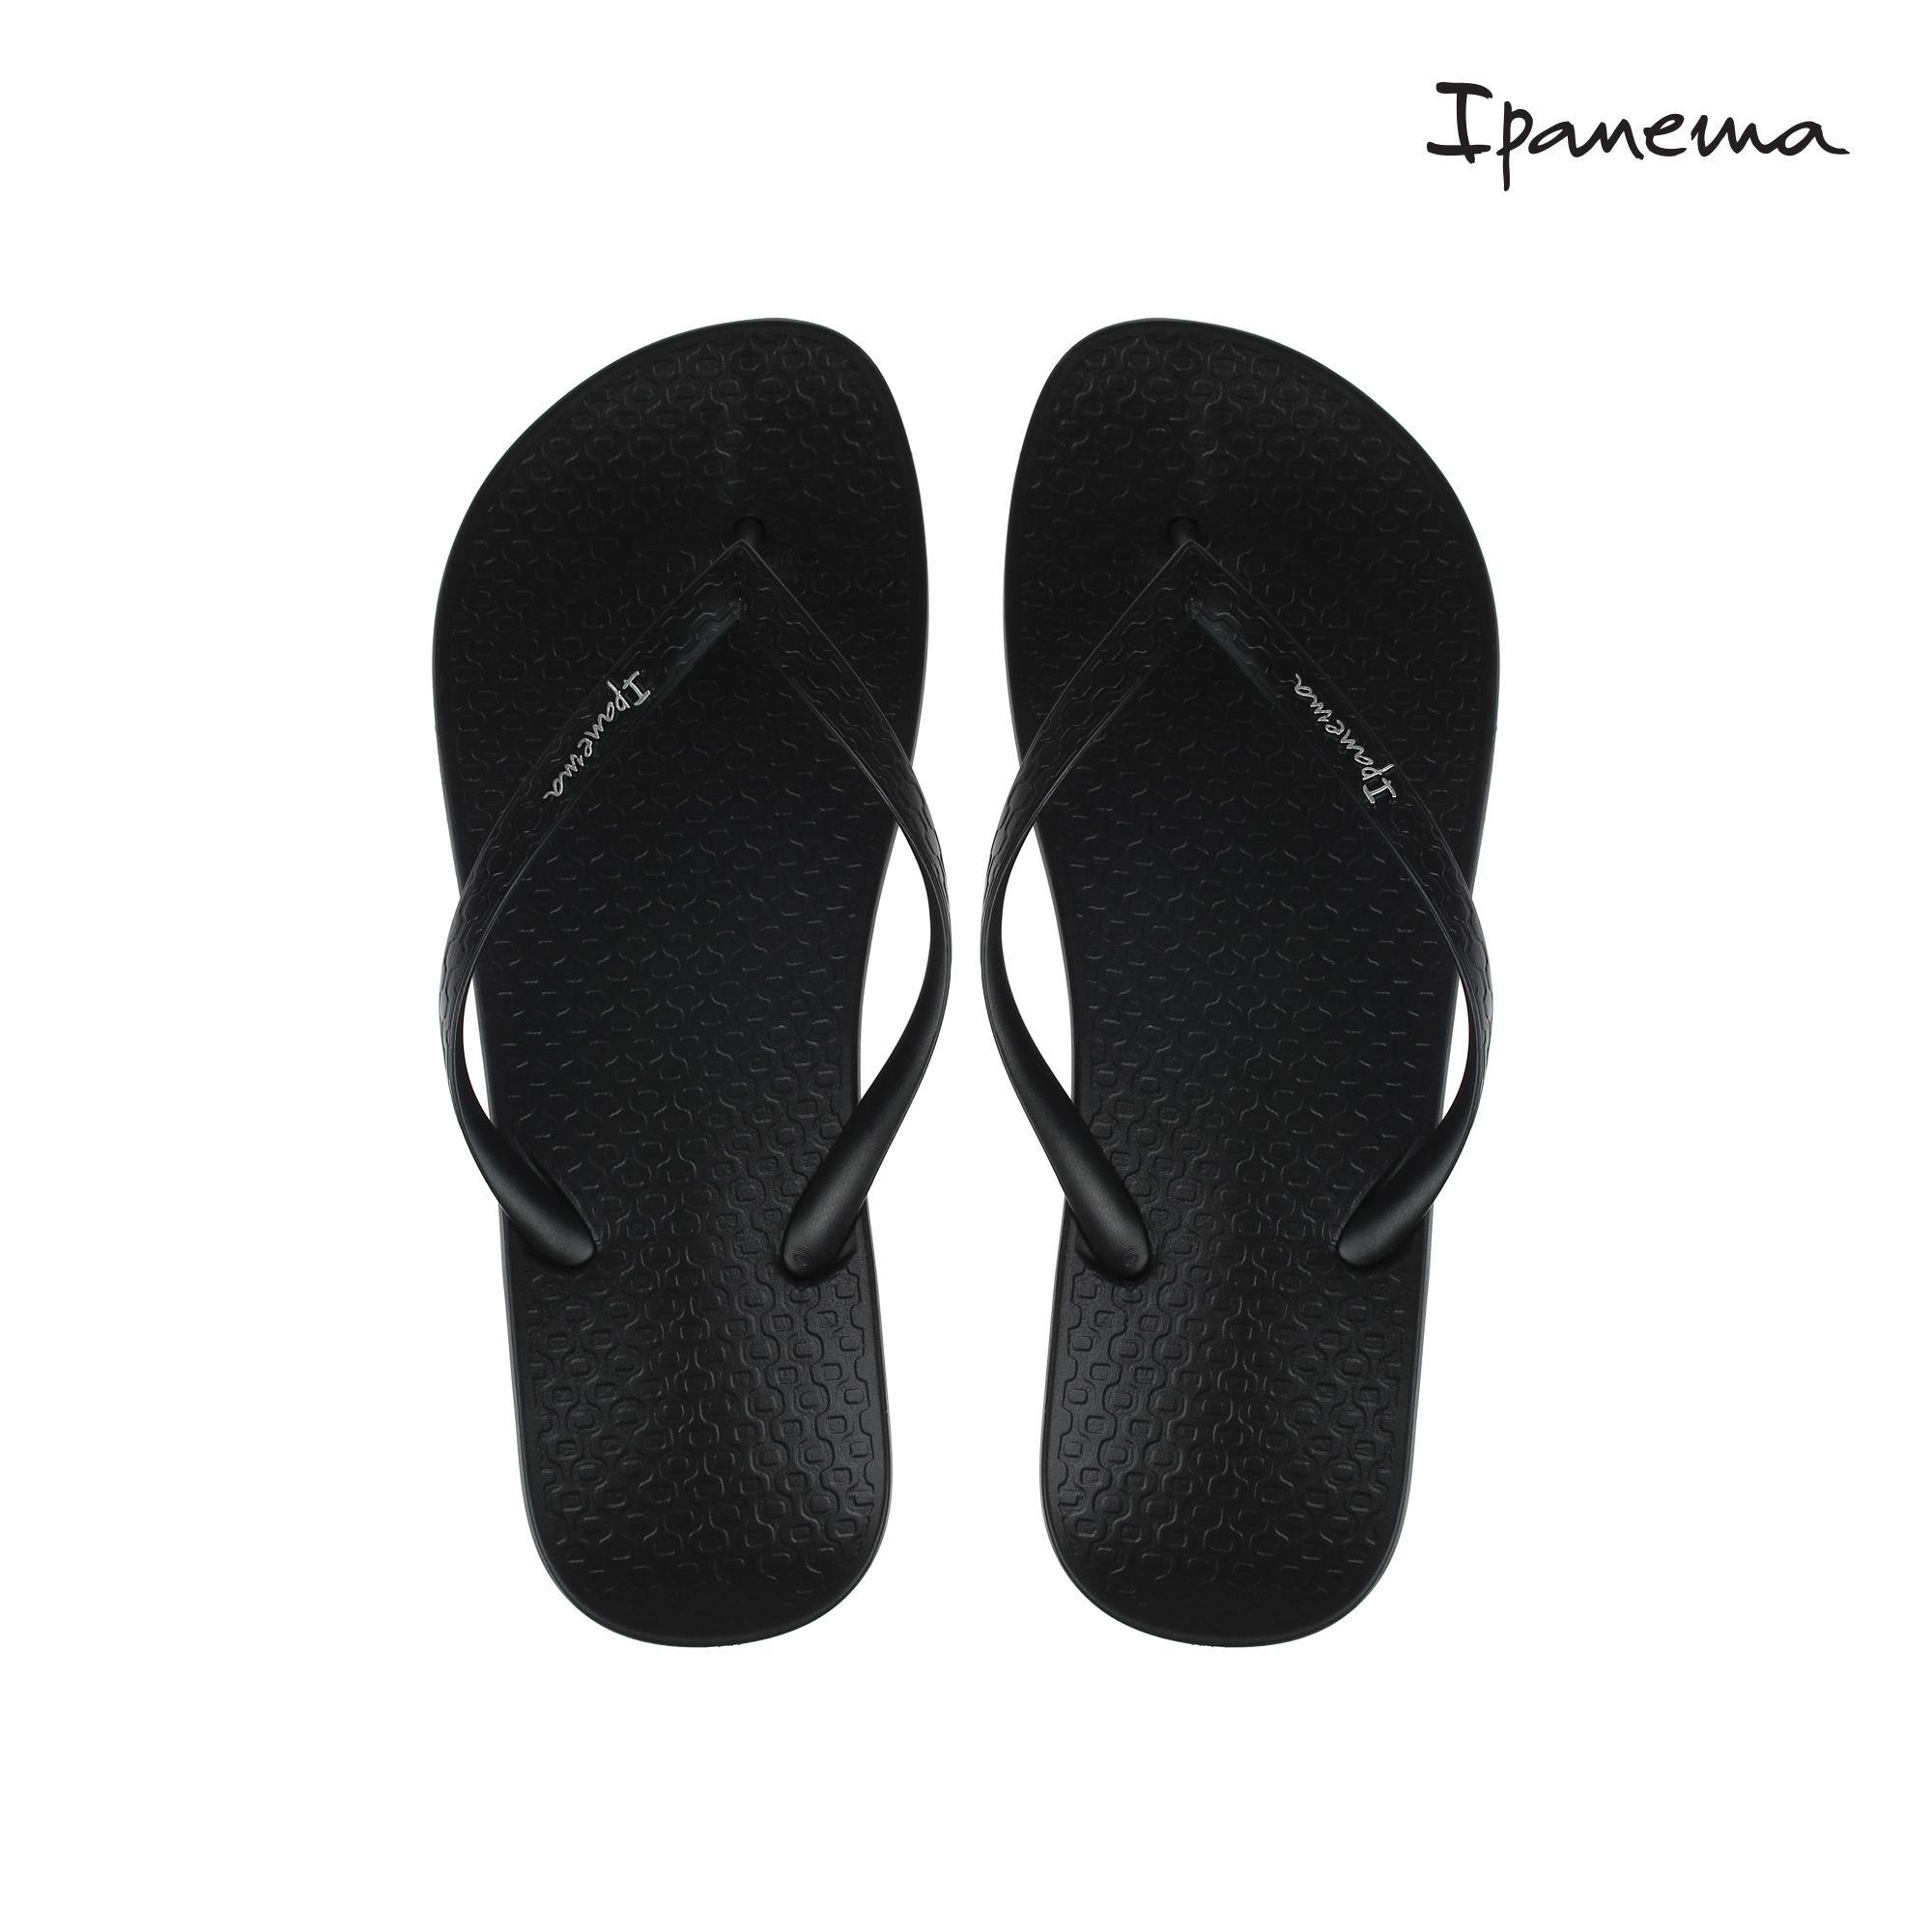 36939e9ef91 Ipanema Philippines  Ipanema price list - Ipanema Flip Flop ...